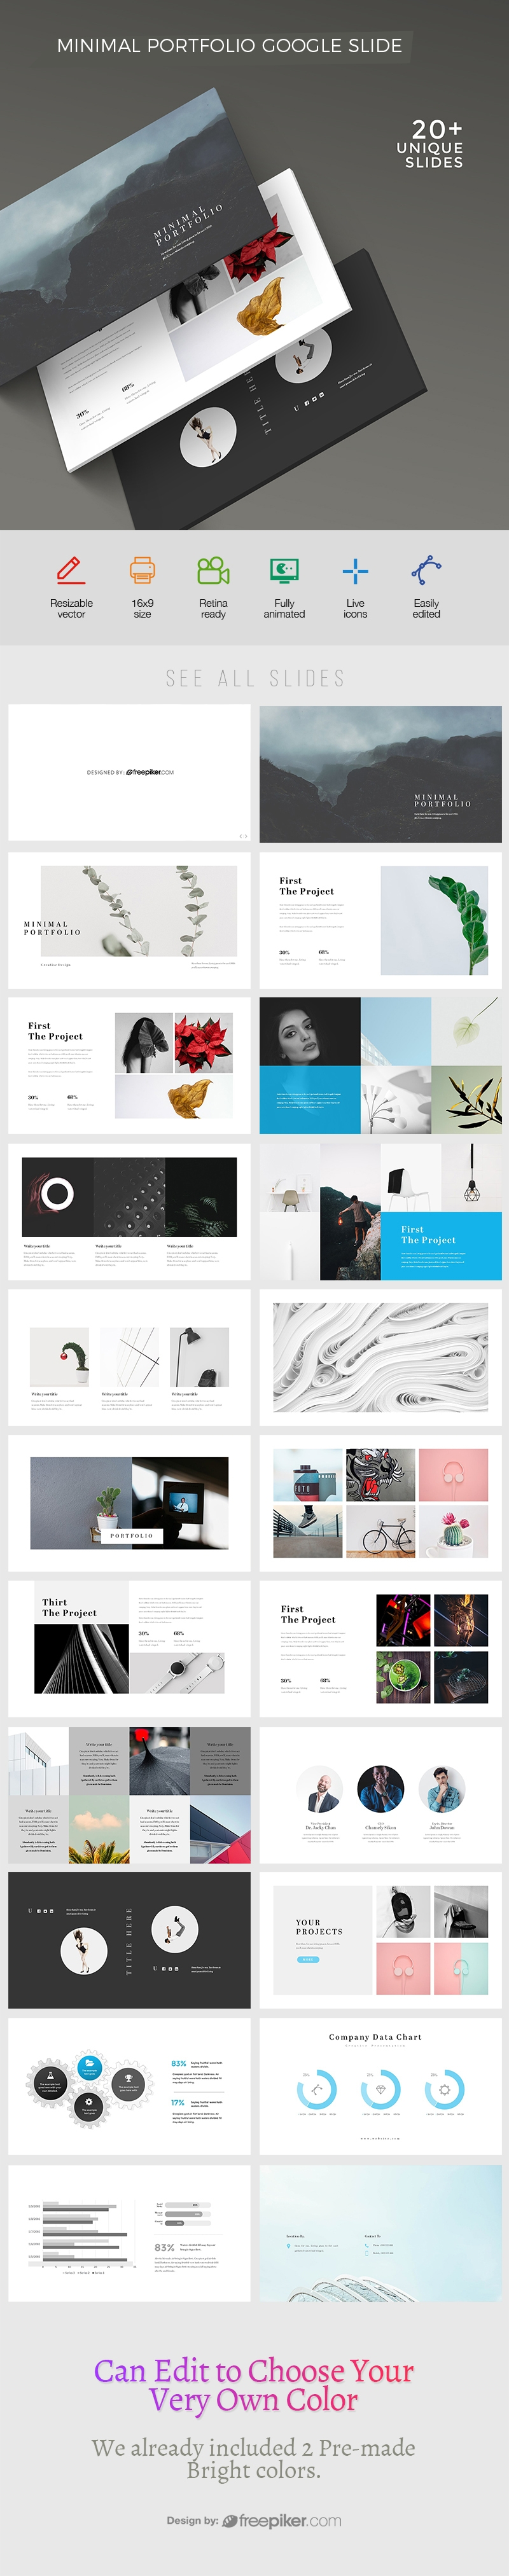 freepiker minimal portfolio google slide template. Black Bedroom Furniture Sets. Home Design Ideas